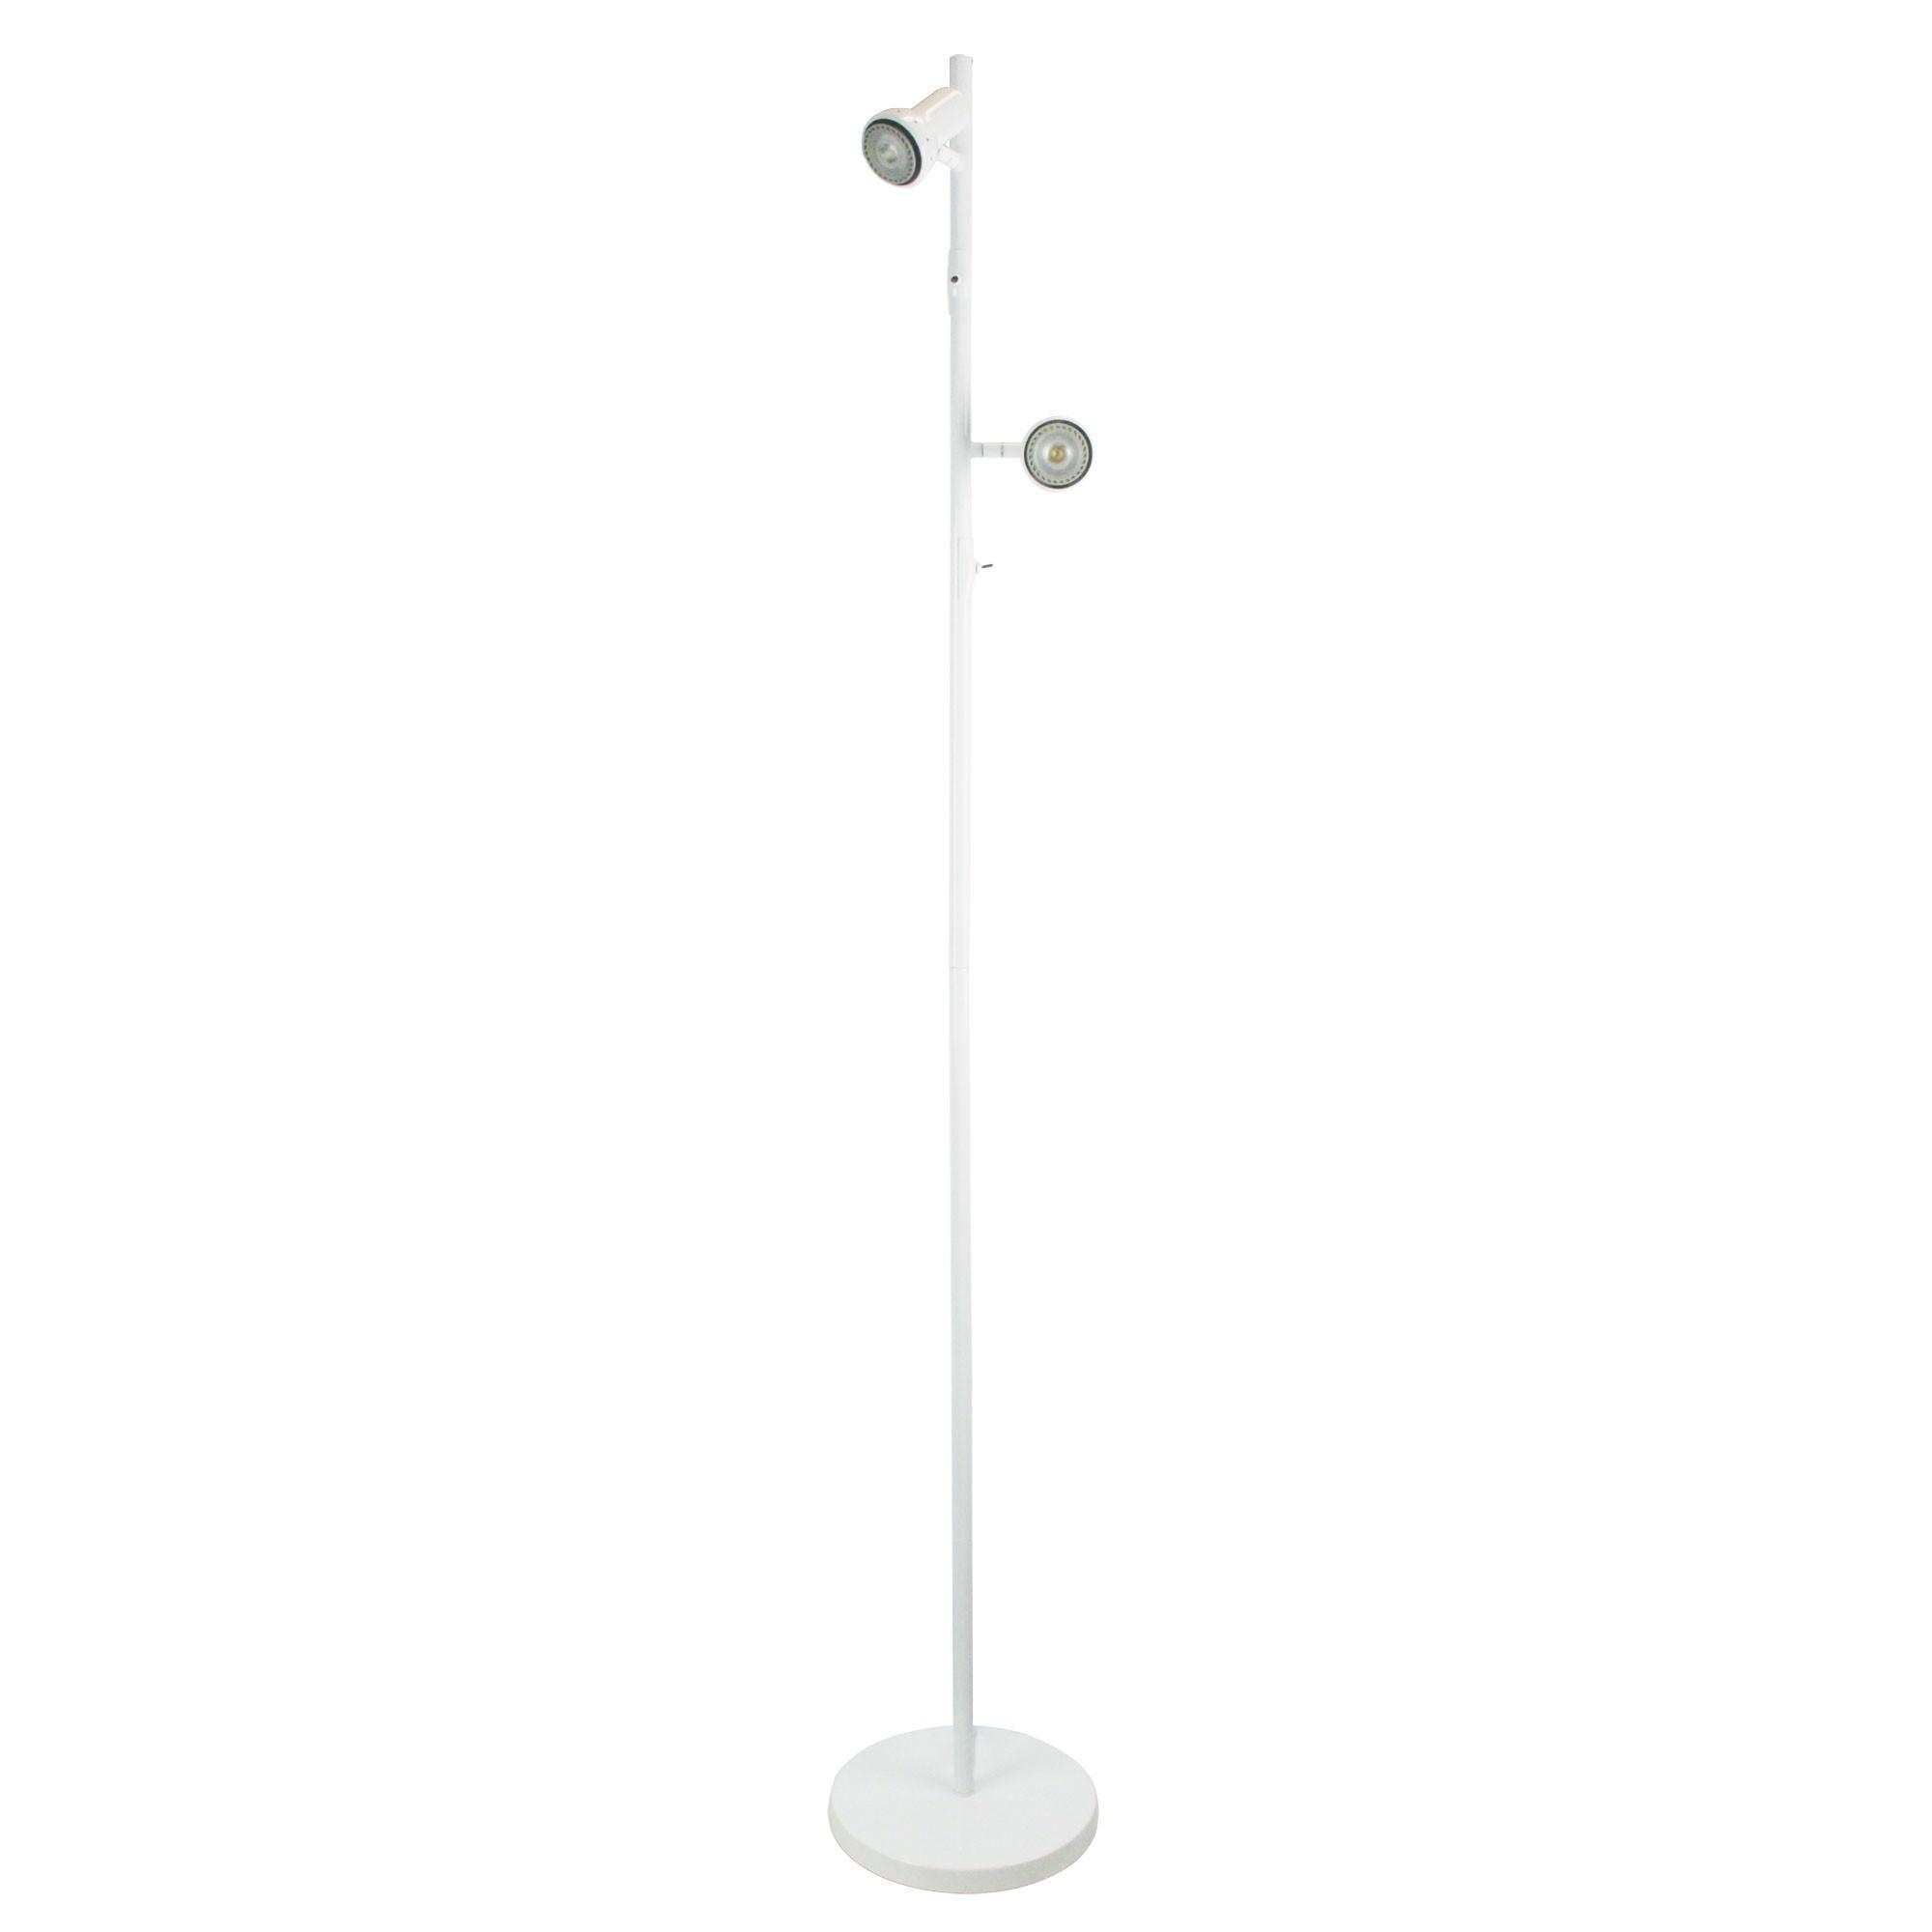 Daxam Metal Twin Adjustable LED Floor Lamp, White